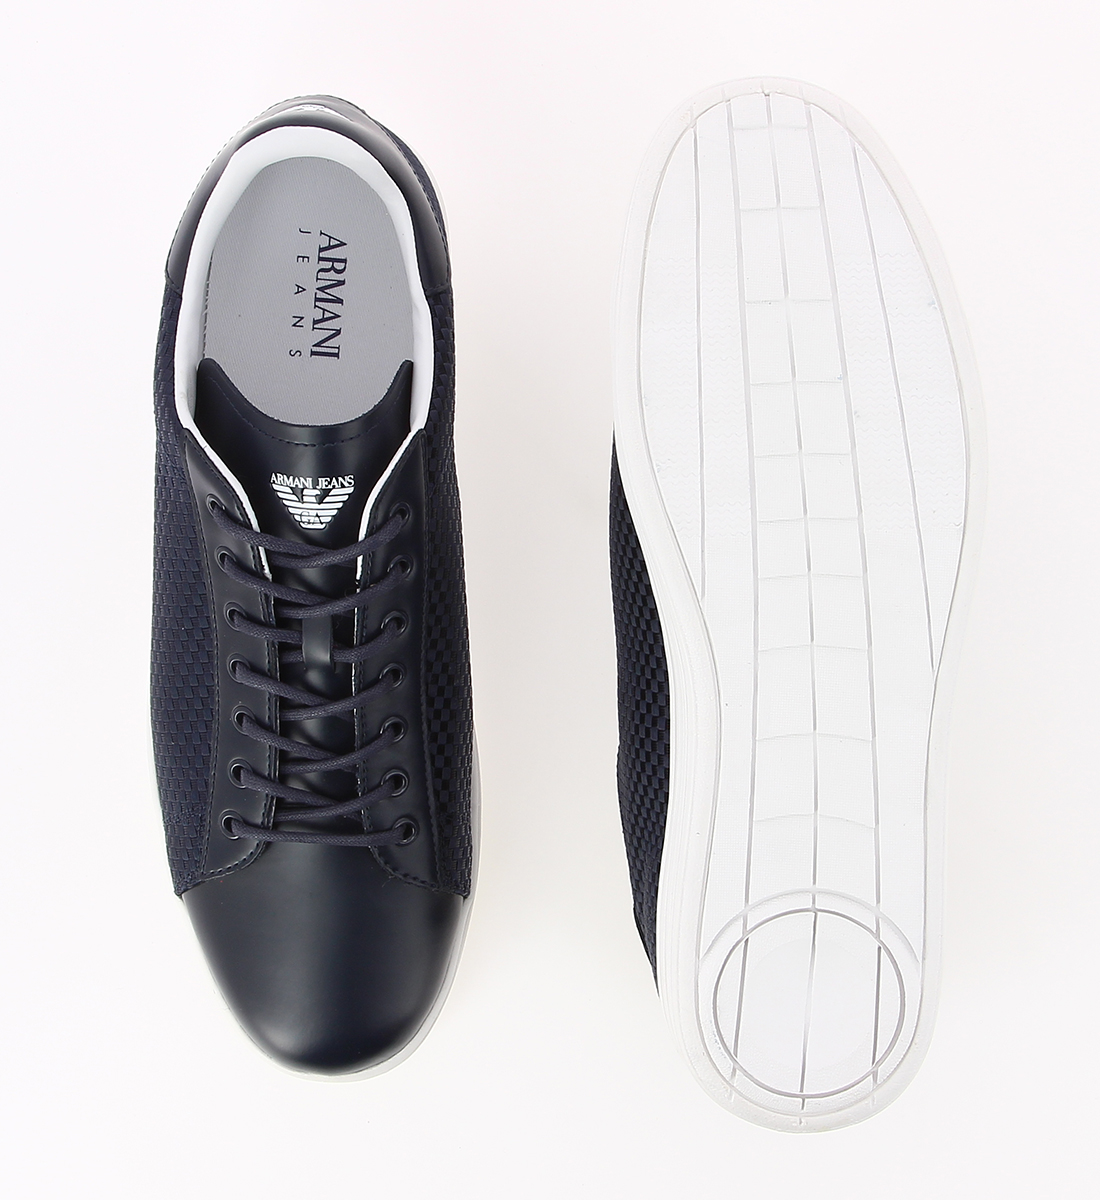 BlancOr MétToutique Adidas Superstar 80s Clean